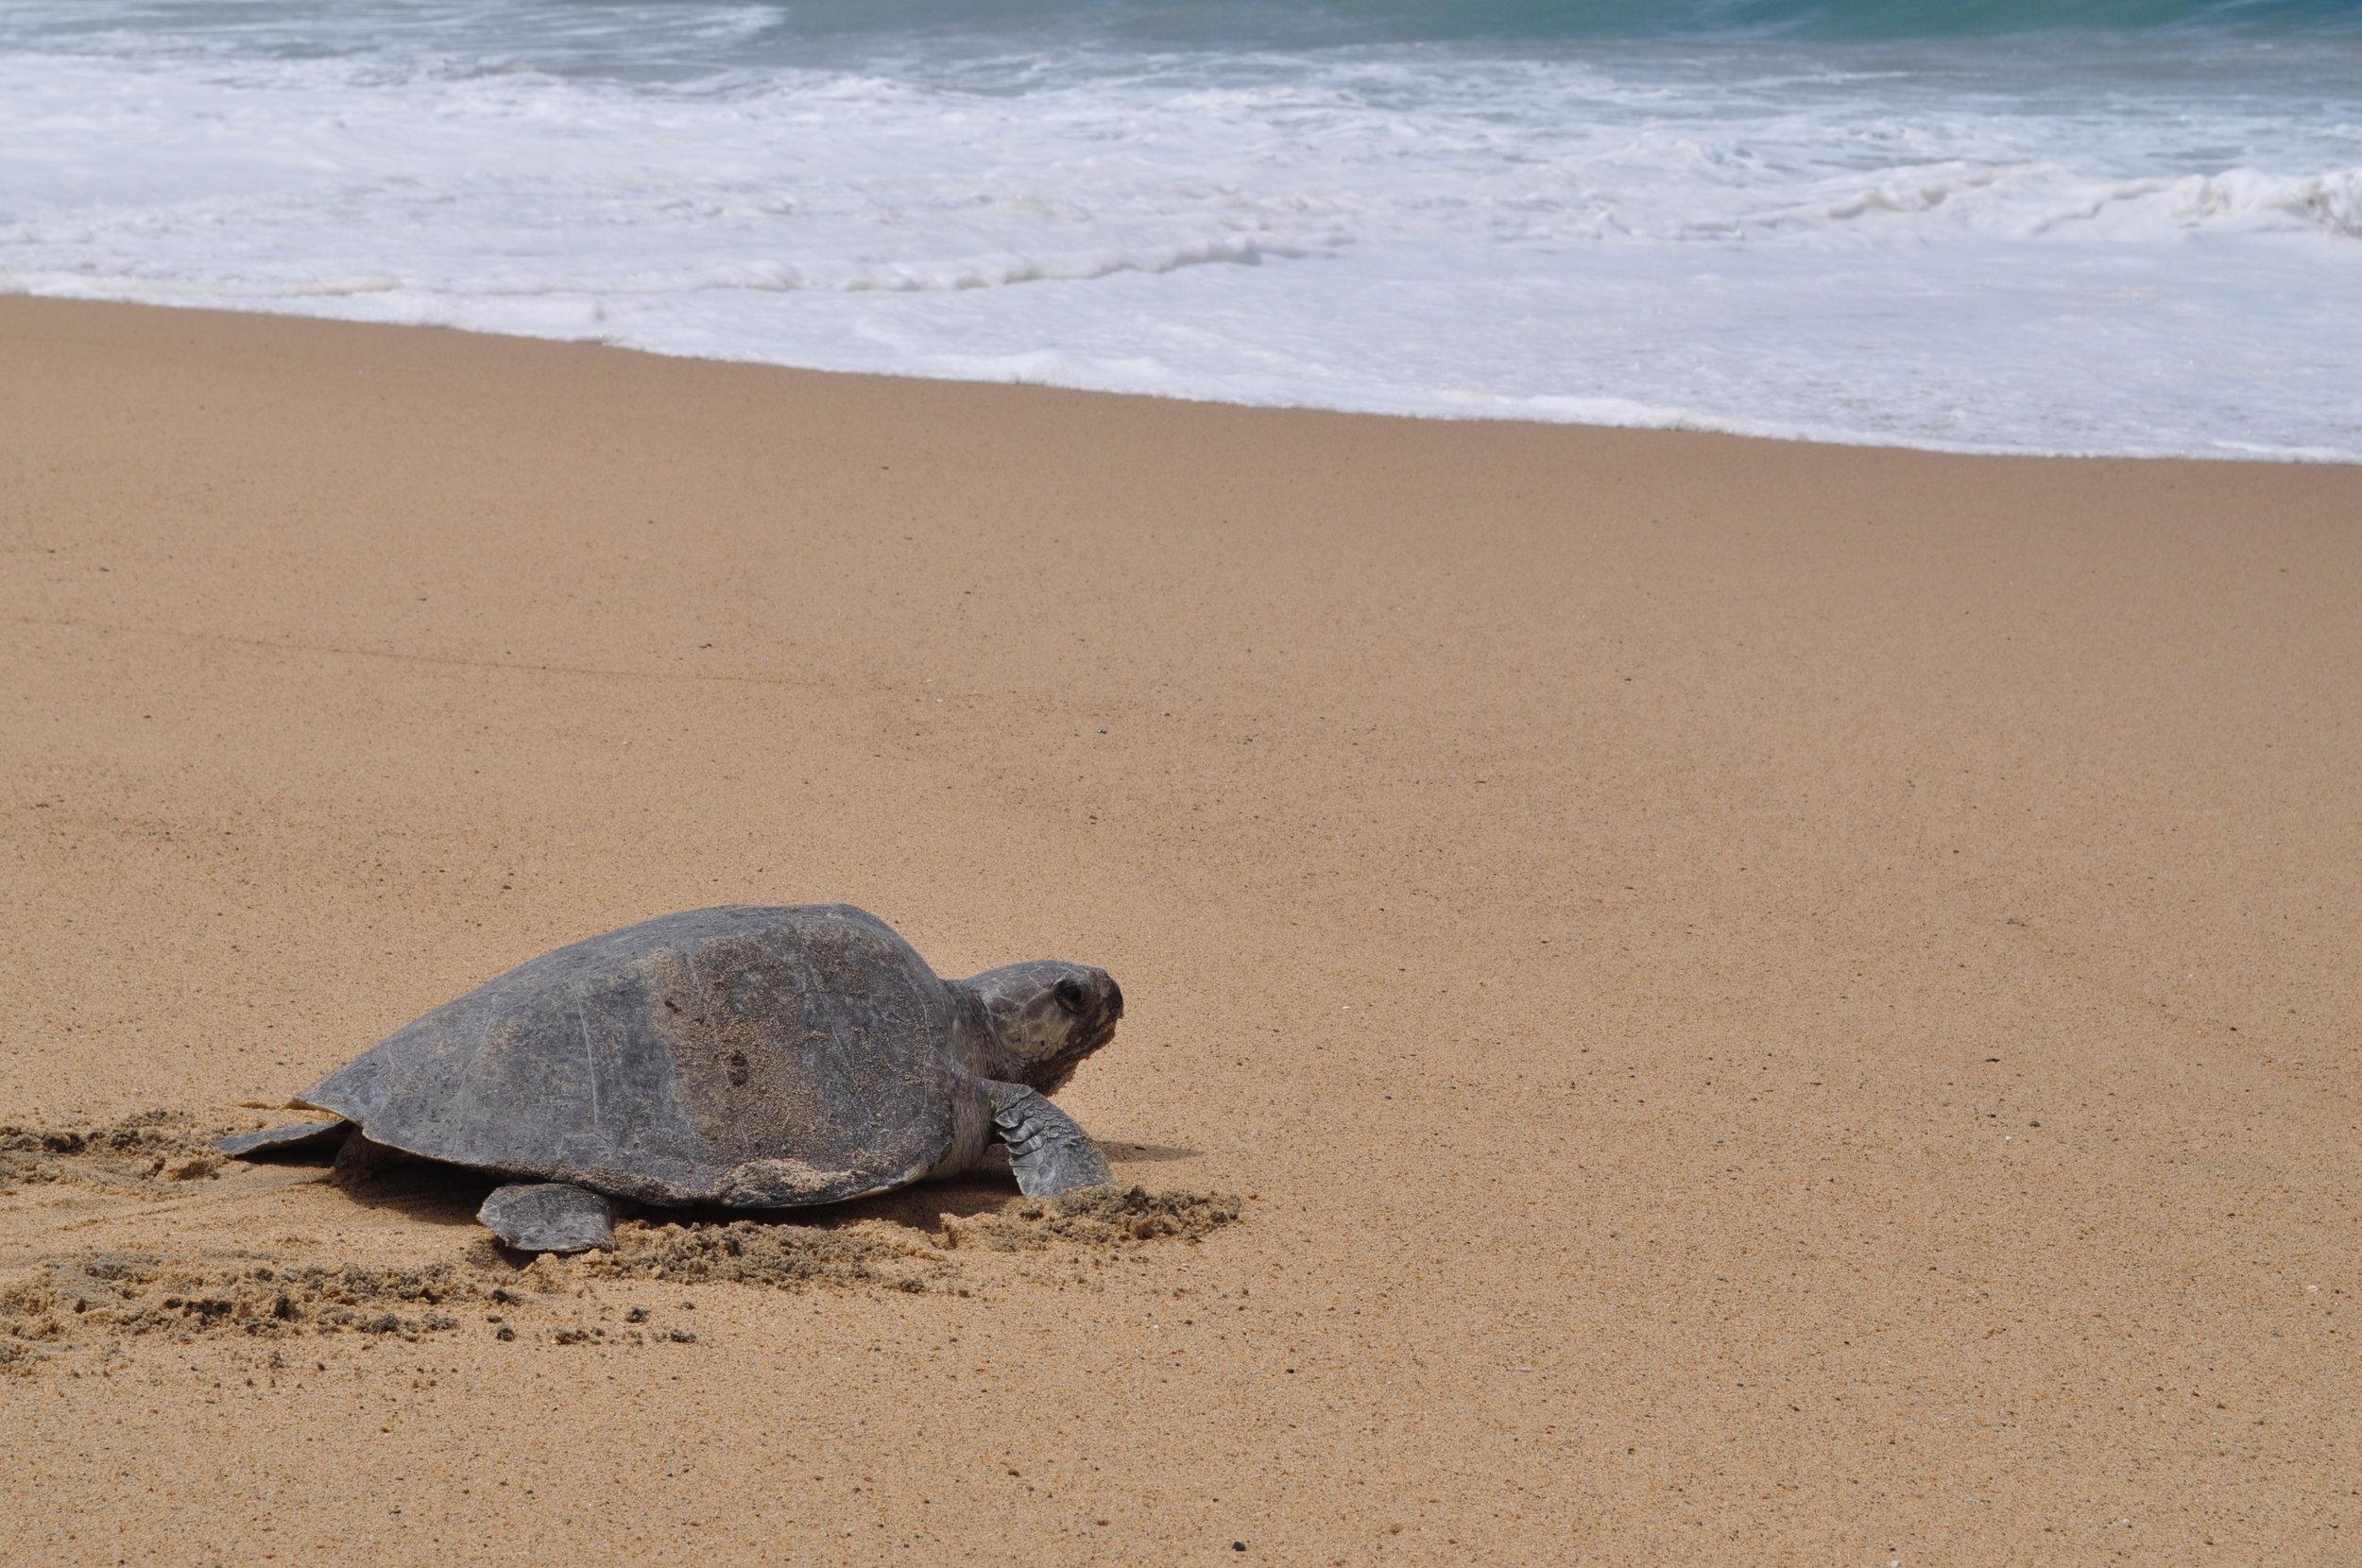 Olive ridley turtle at Ixtapilla